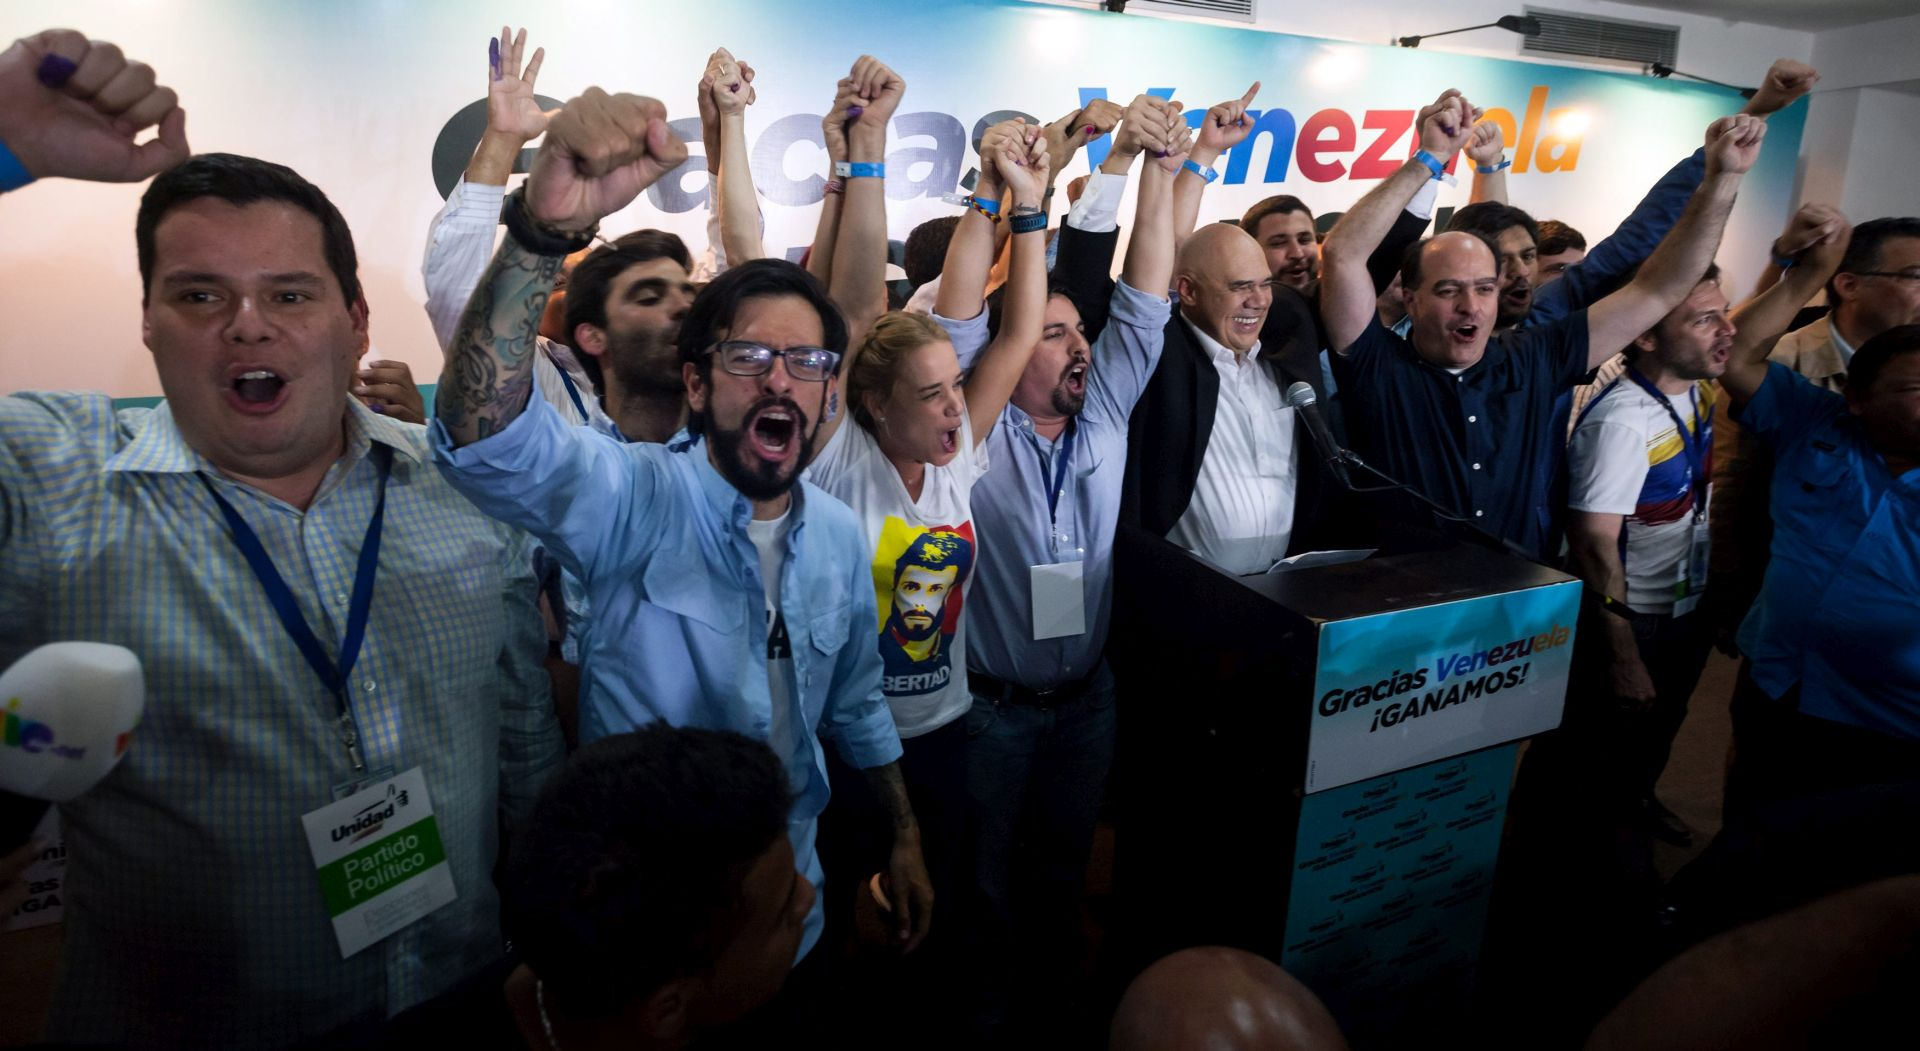 Izbori u Venezueli: Oporba osvojila većinu u parlamentu